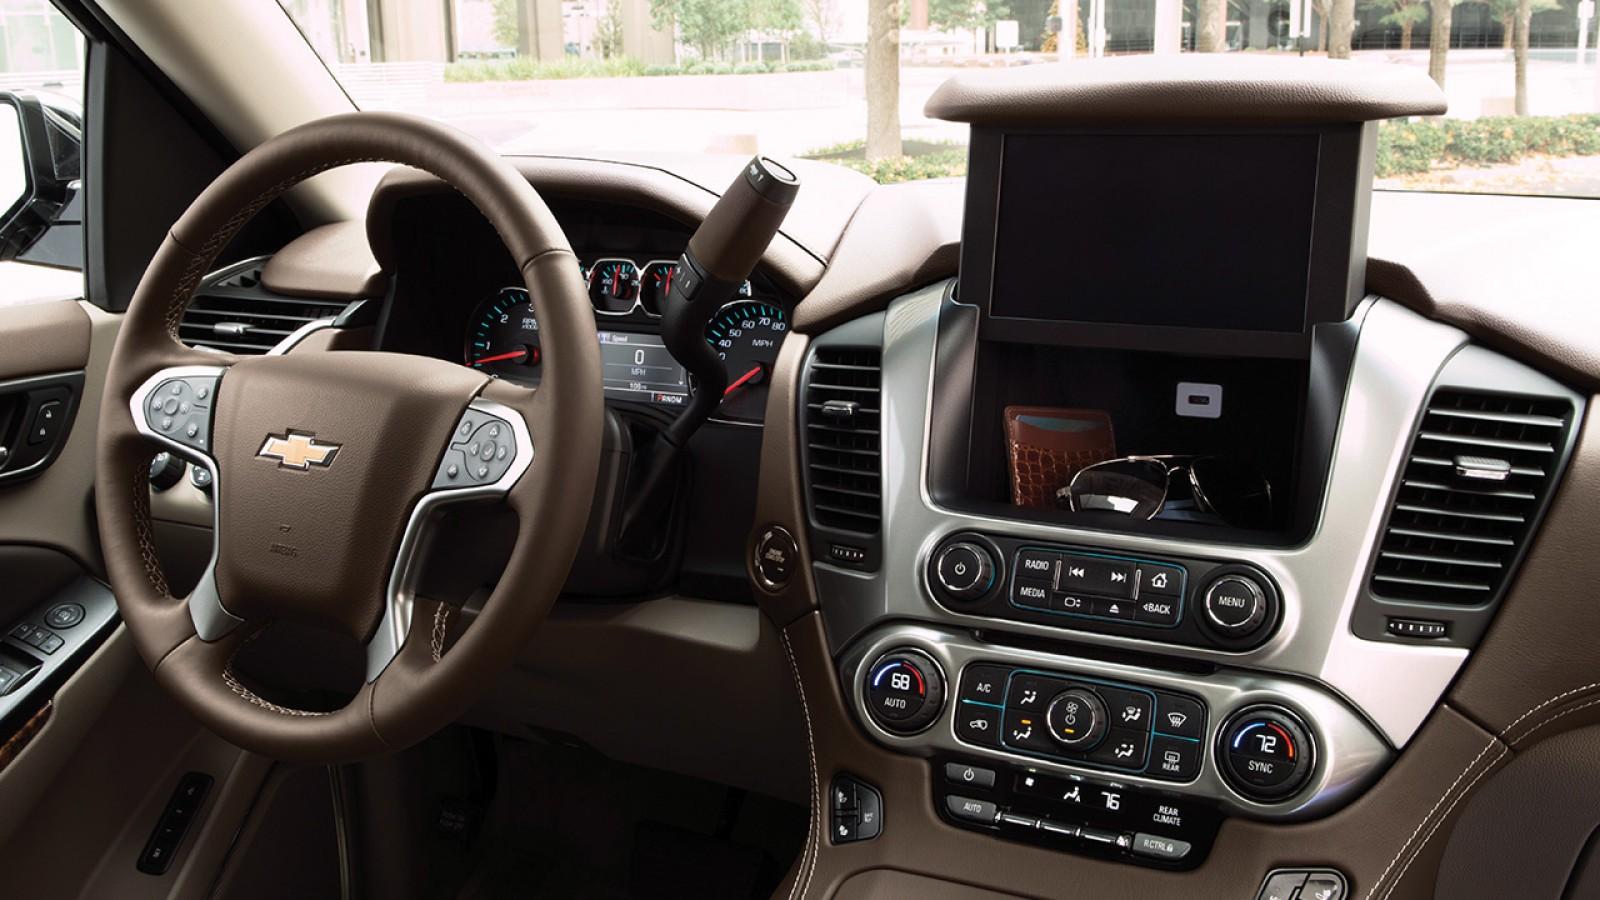 Chevrolet Tahoe 2018 Interior Controles Autos Actual Mxico